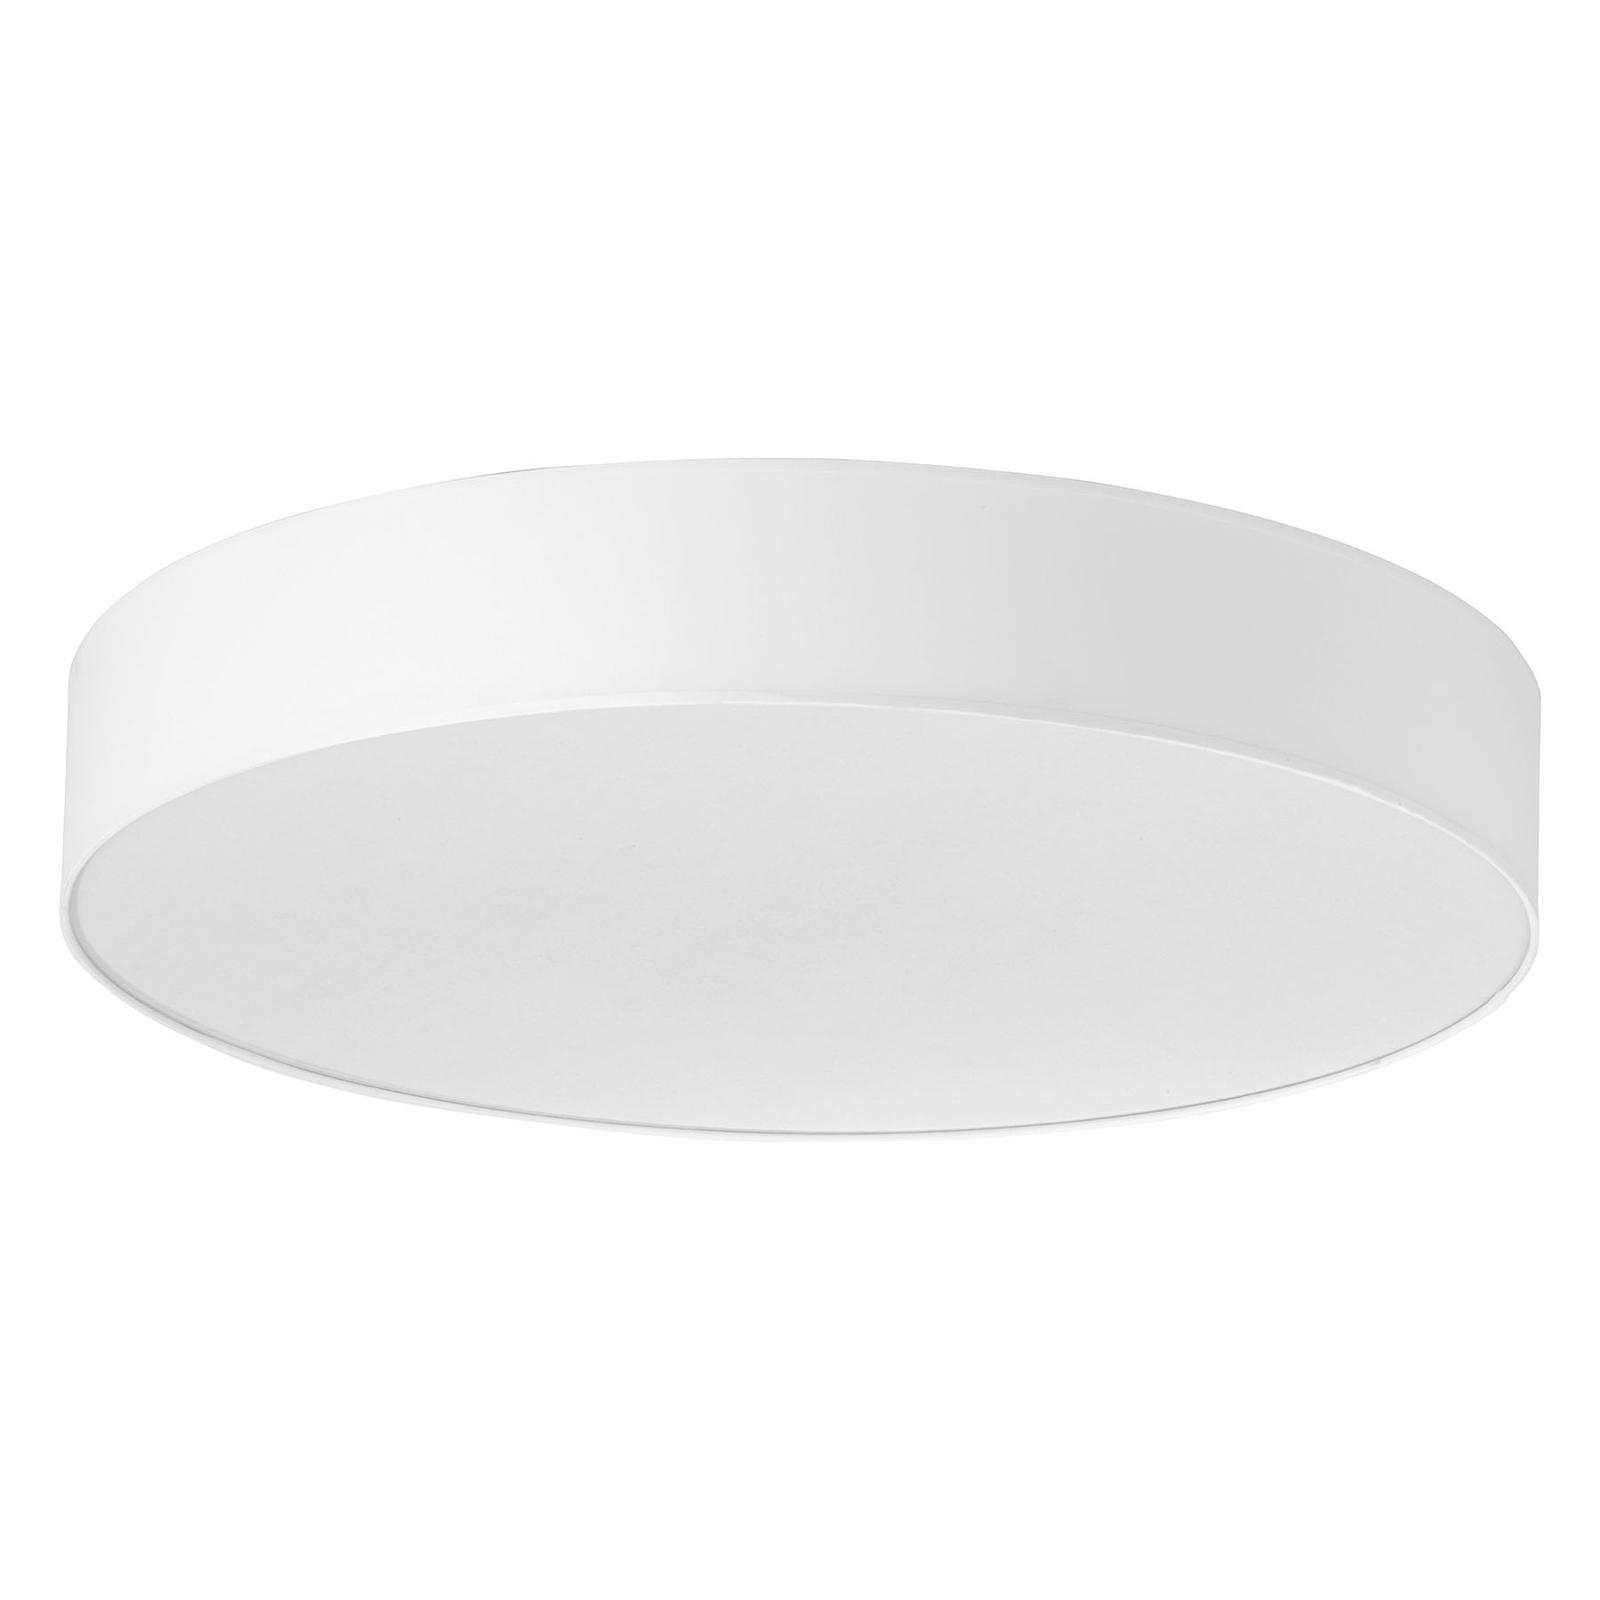 Rondo taklampe, hvit Ø 80 cm